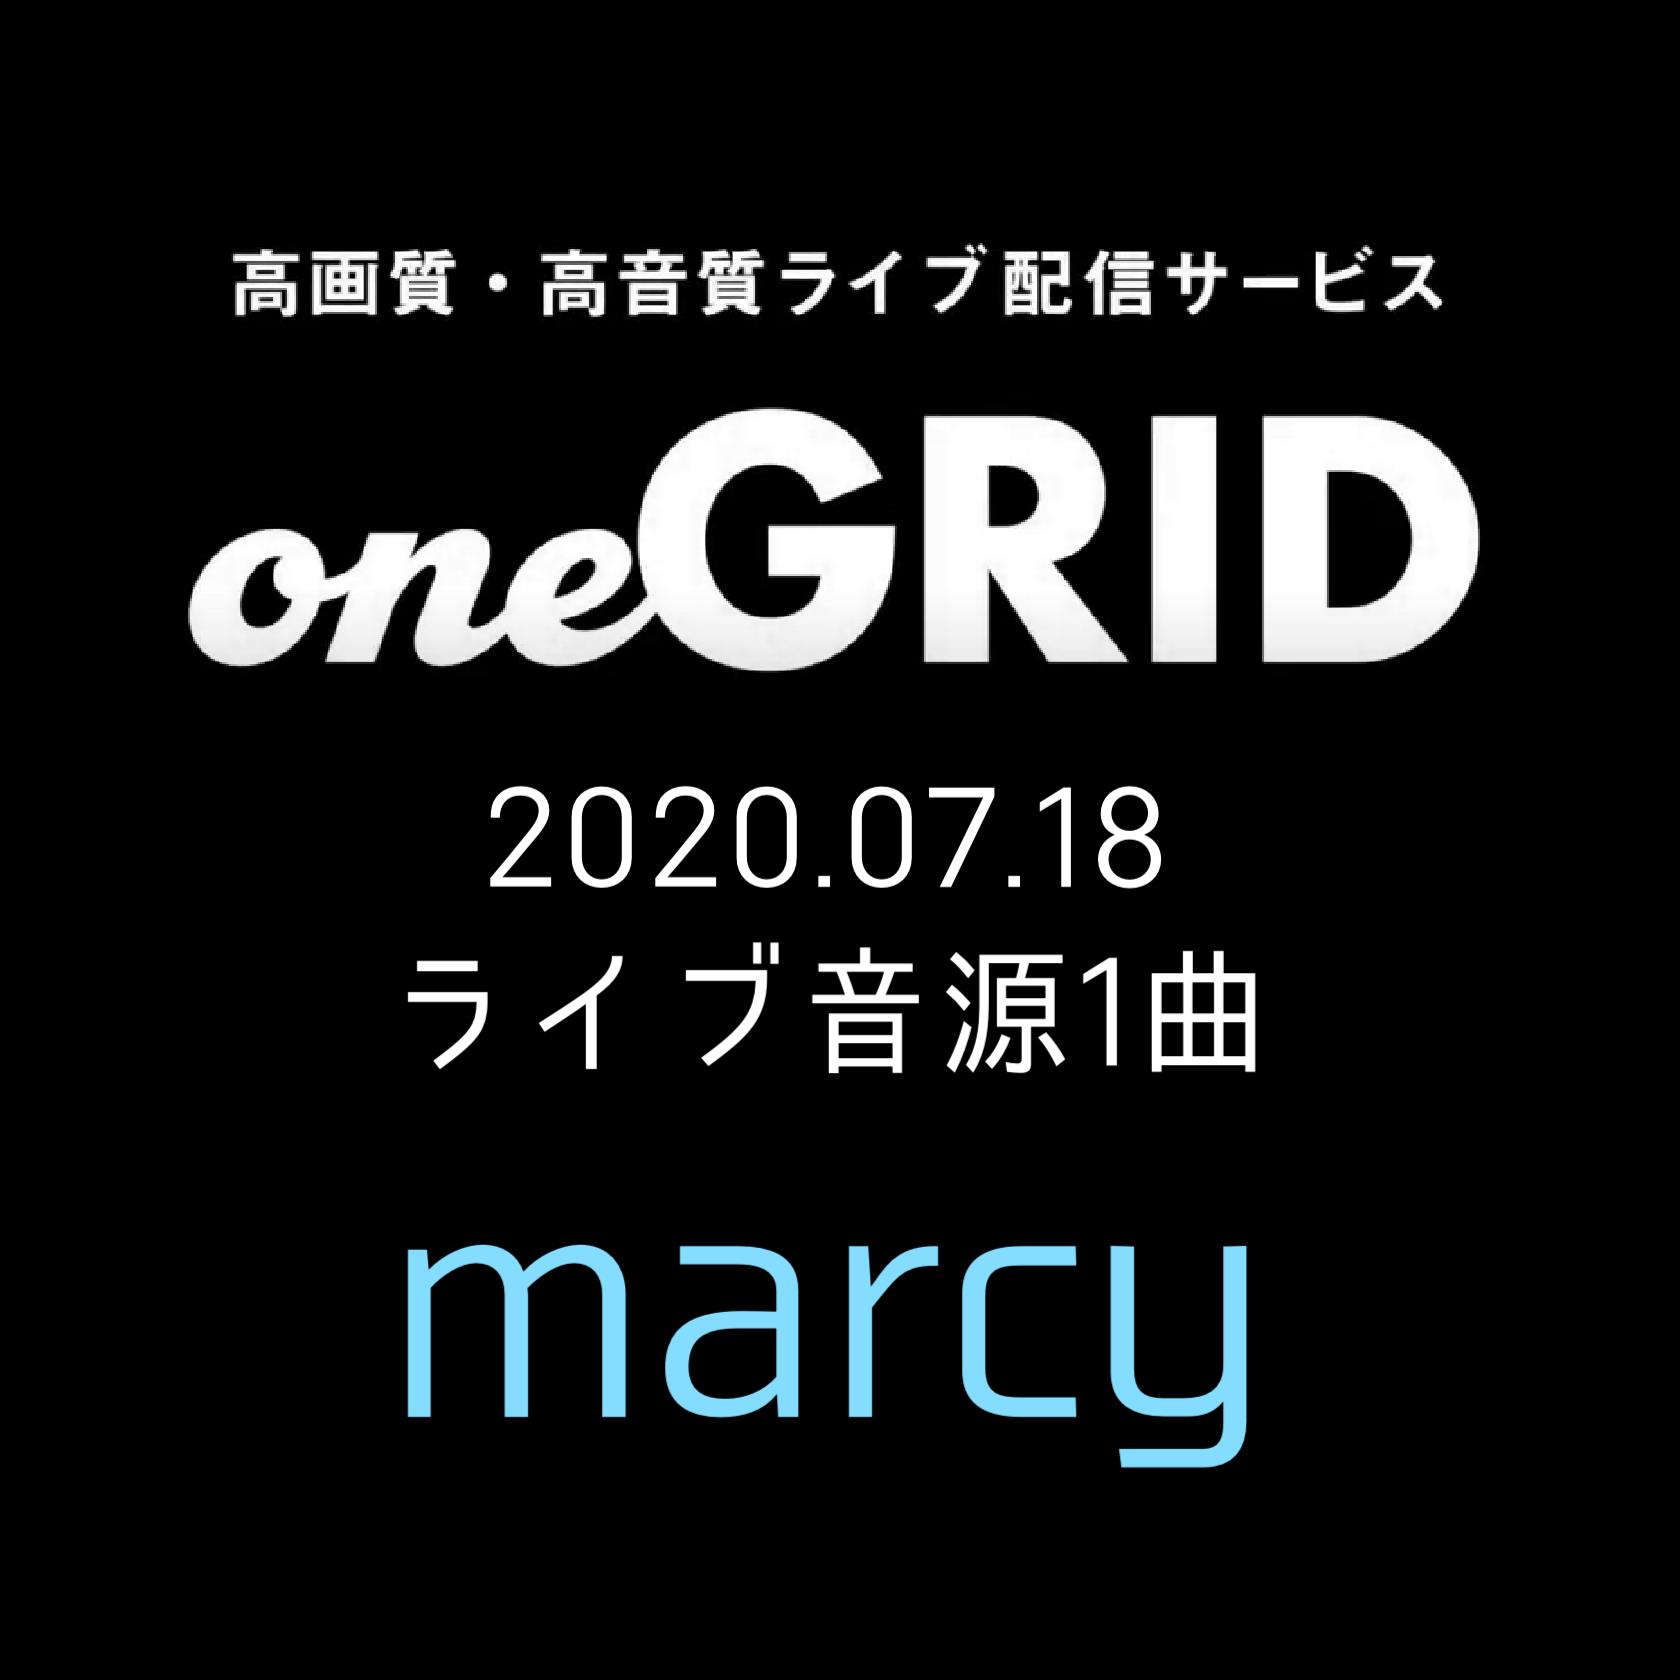 7/18marcyライブ音源